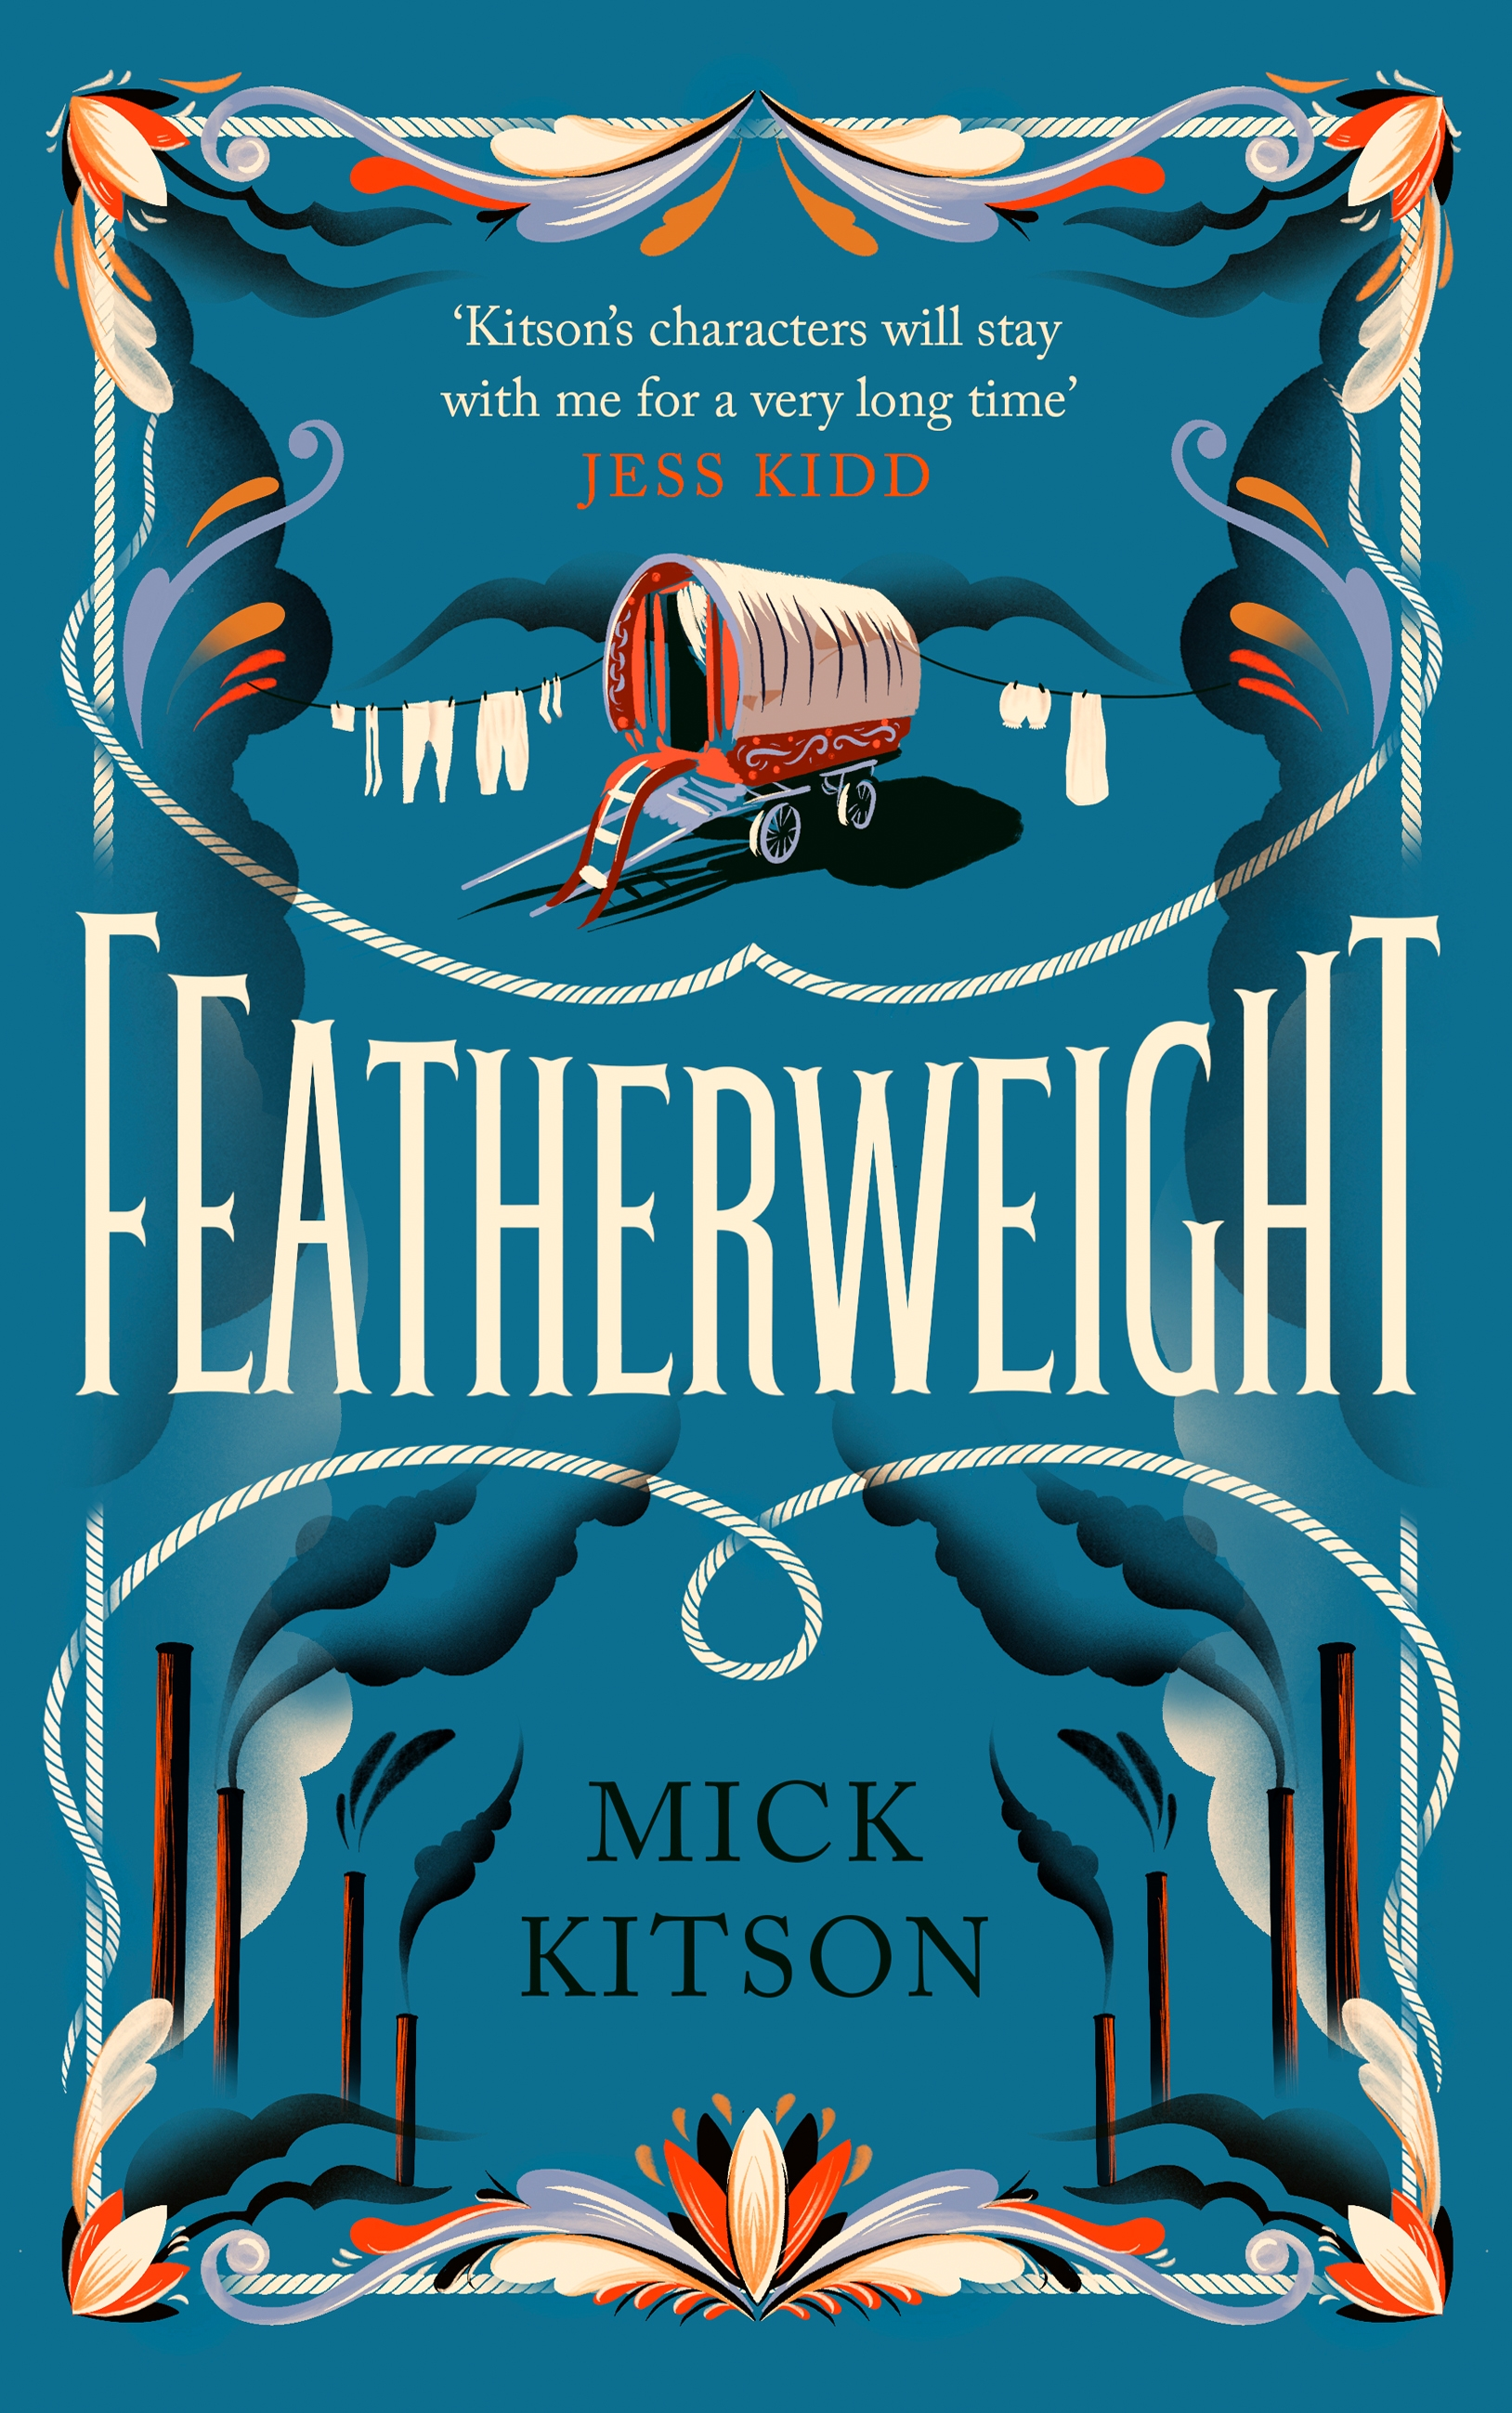 Featherweight by Mick Kitson